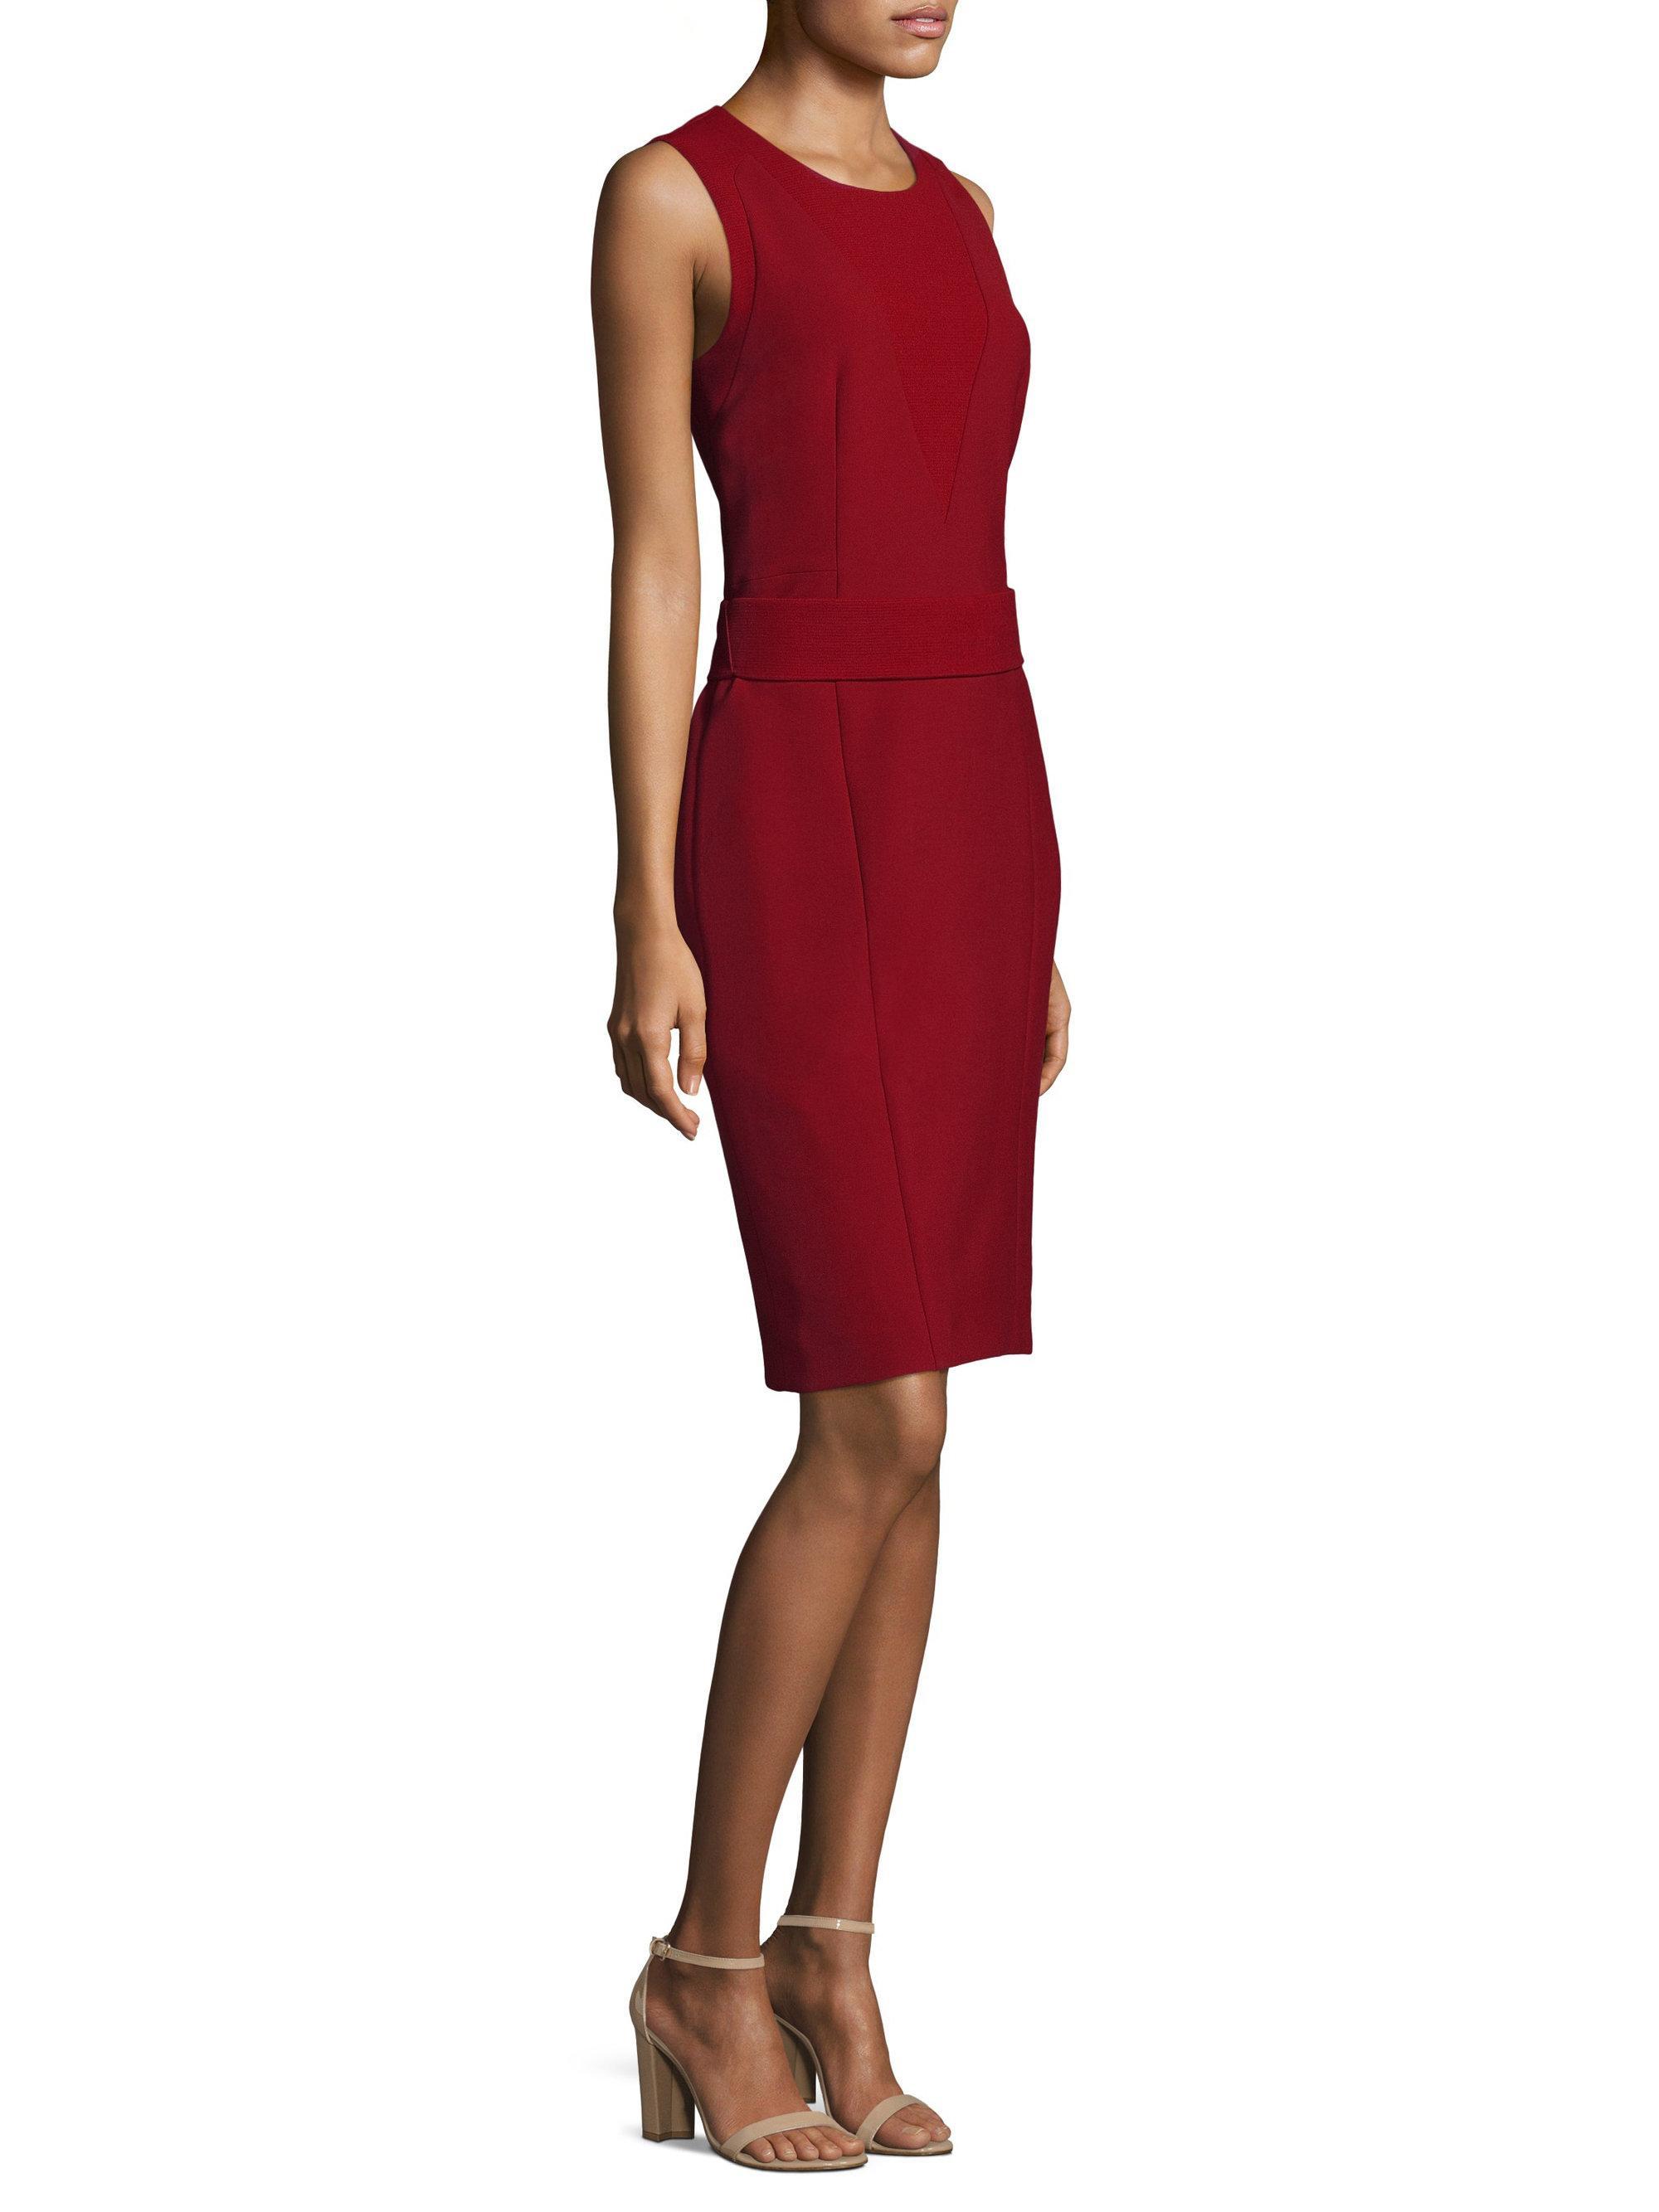 Lyst boss dirasana sheath dress in red for Saks fifth avenue wedding guest dresses